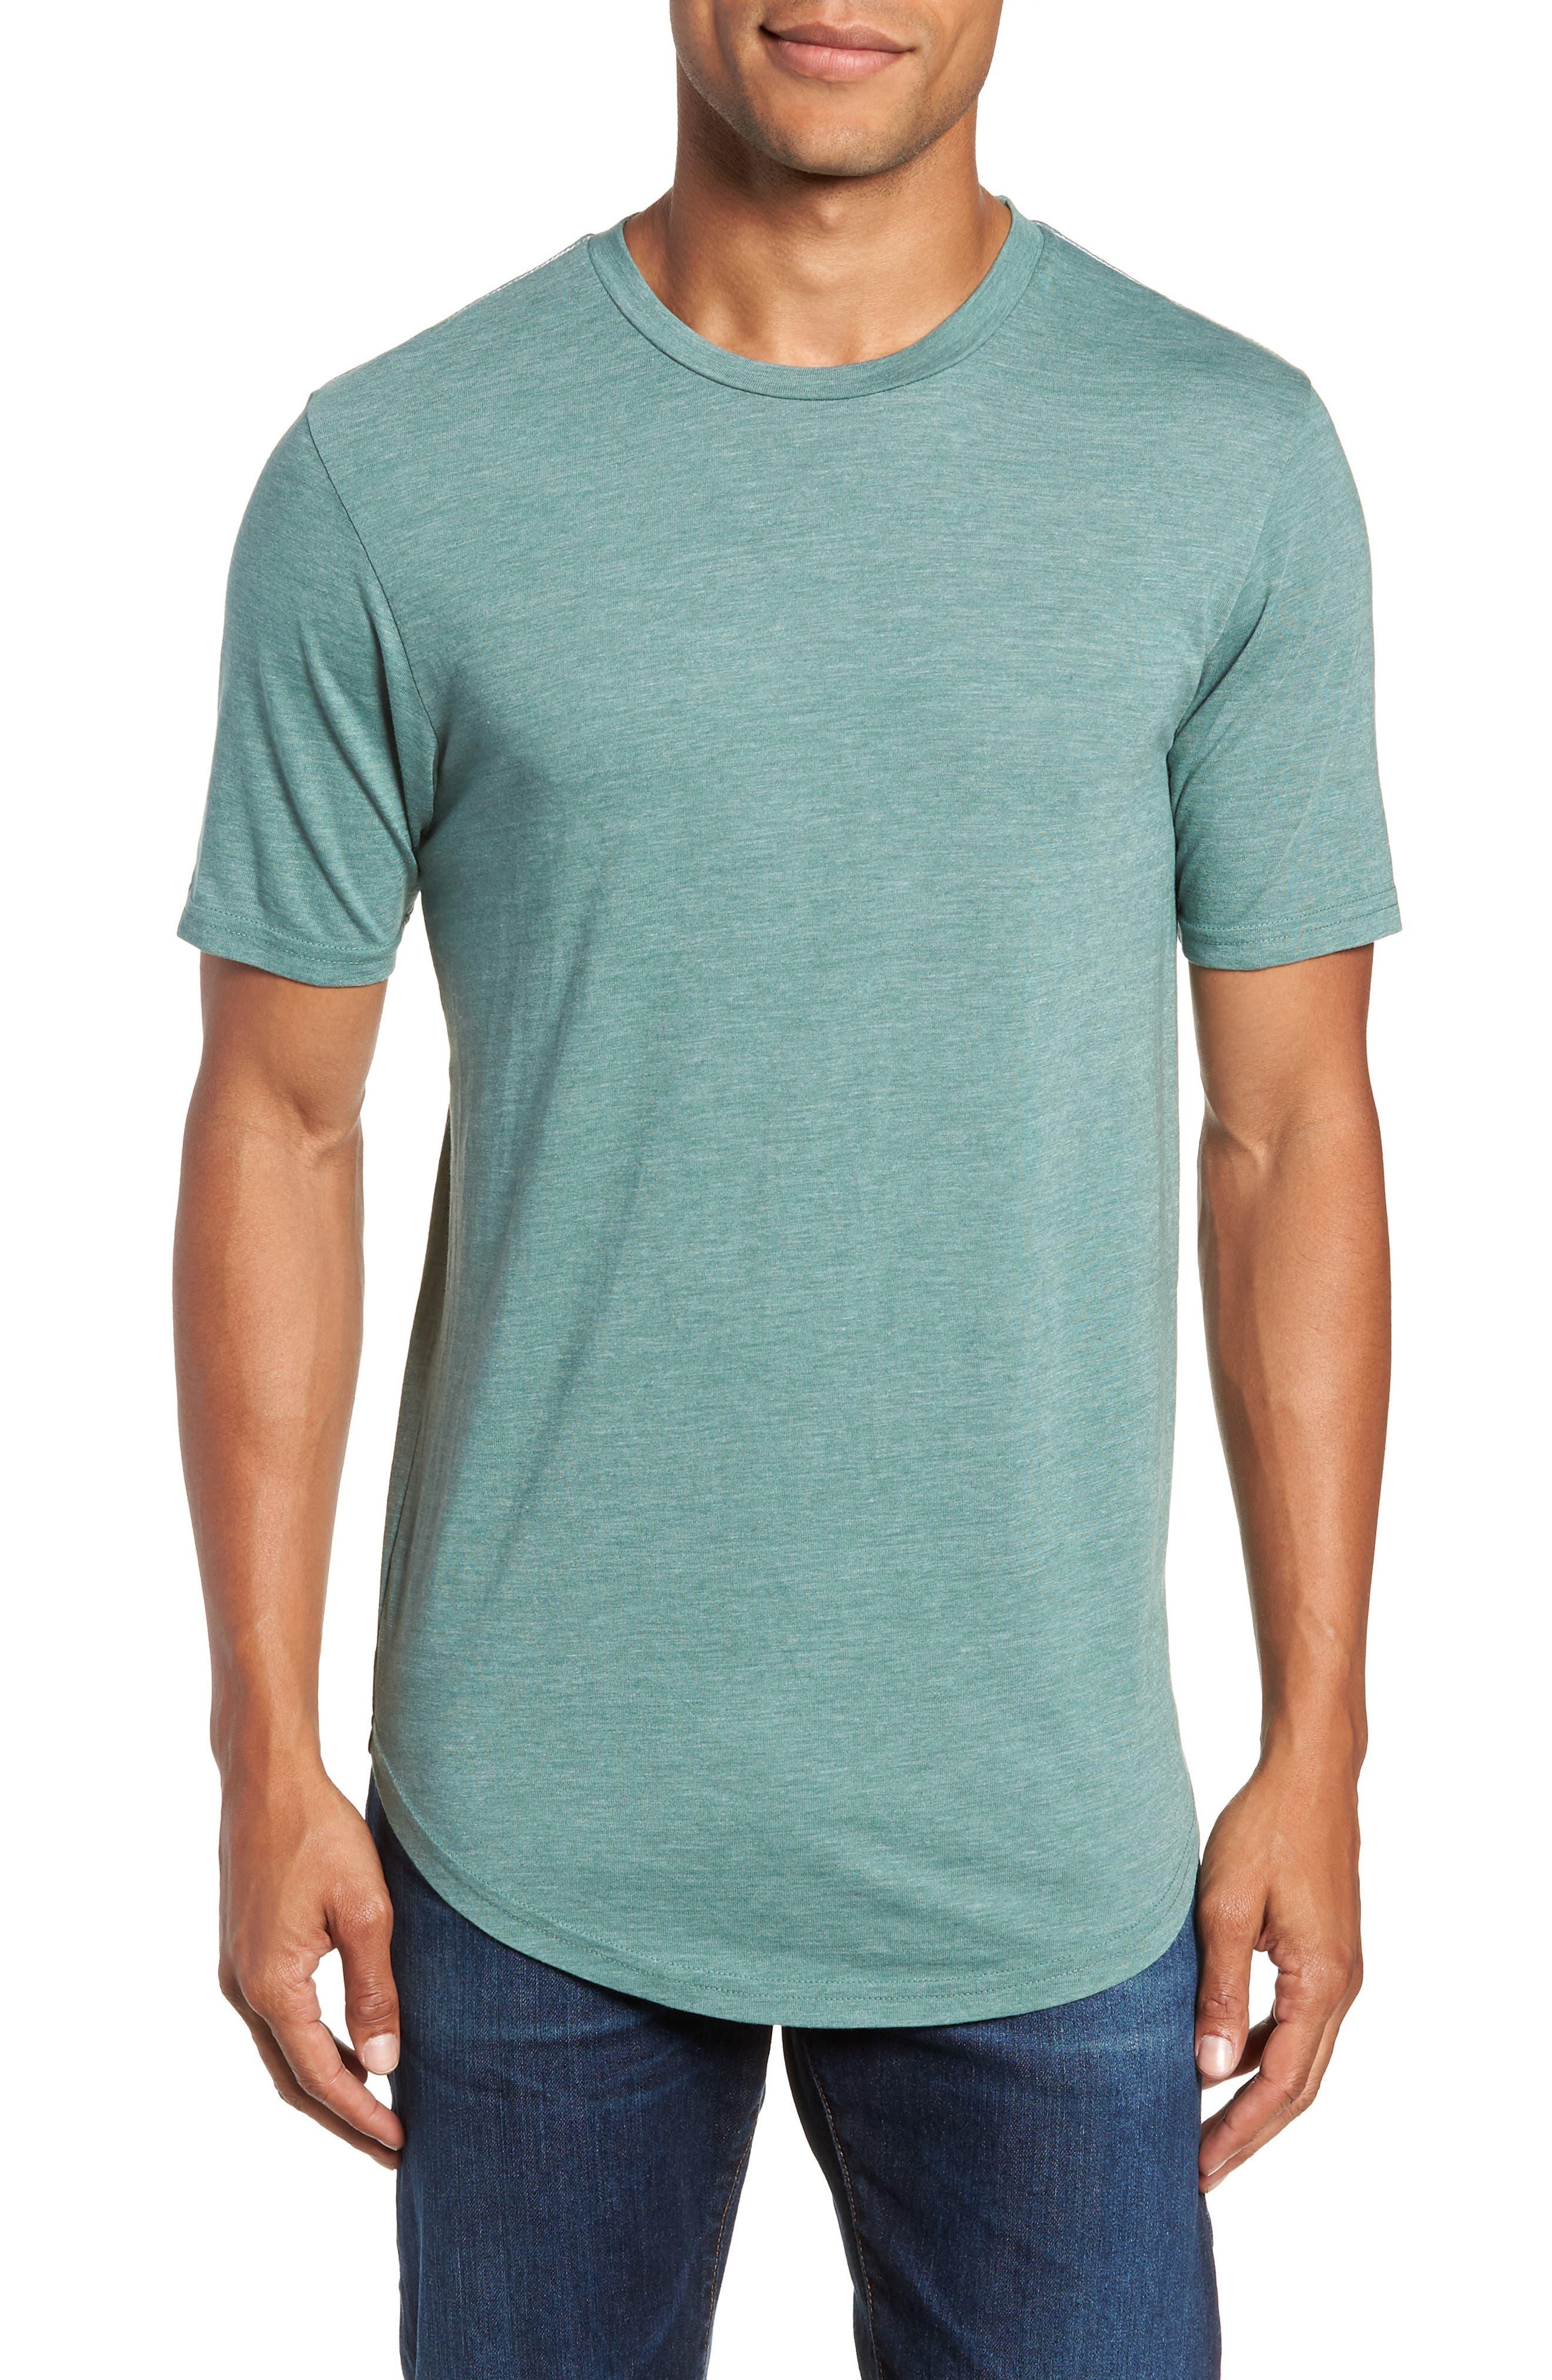 Scallop Triblend Crewneck T-Shirt,                             Main thumbnail 1, color,                             PINE